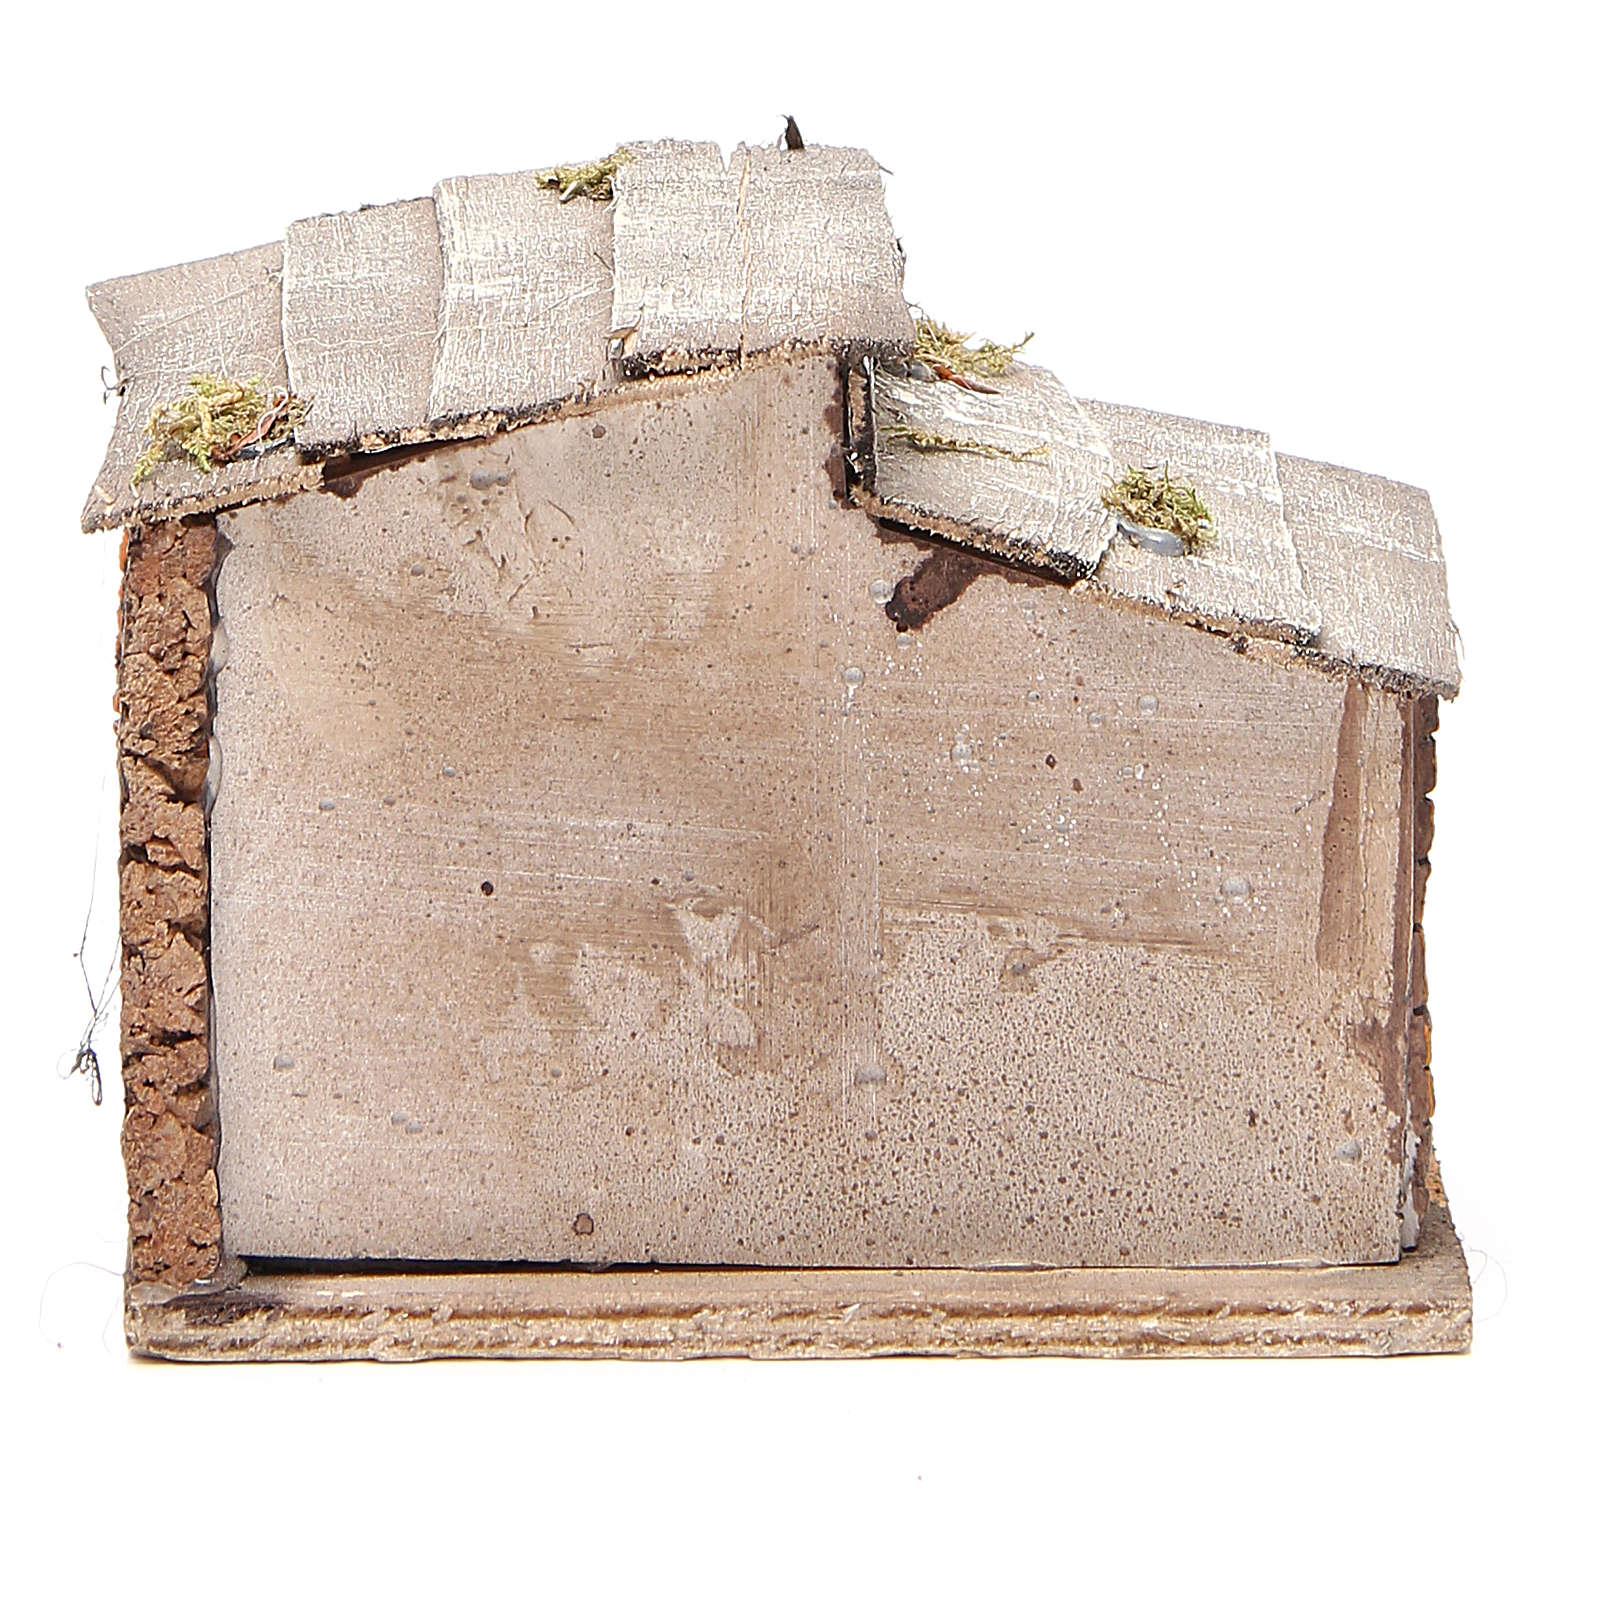 Capanna legno resina sughero presepe Napoli 14x15x10 cm 4